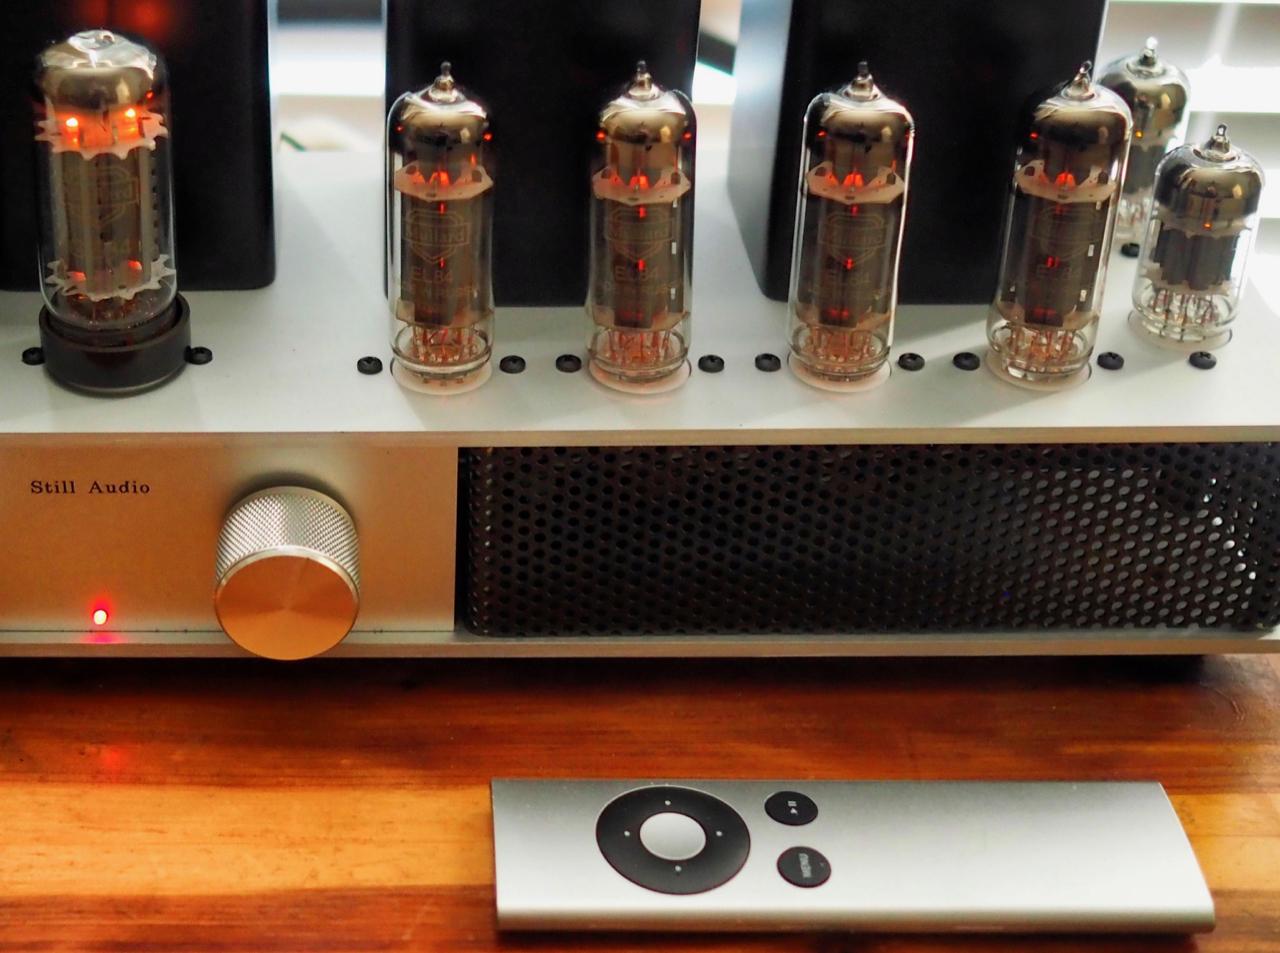 Sneak Peek: The Still Audio EL84 Integrated Amplifier Review for